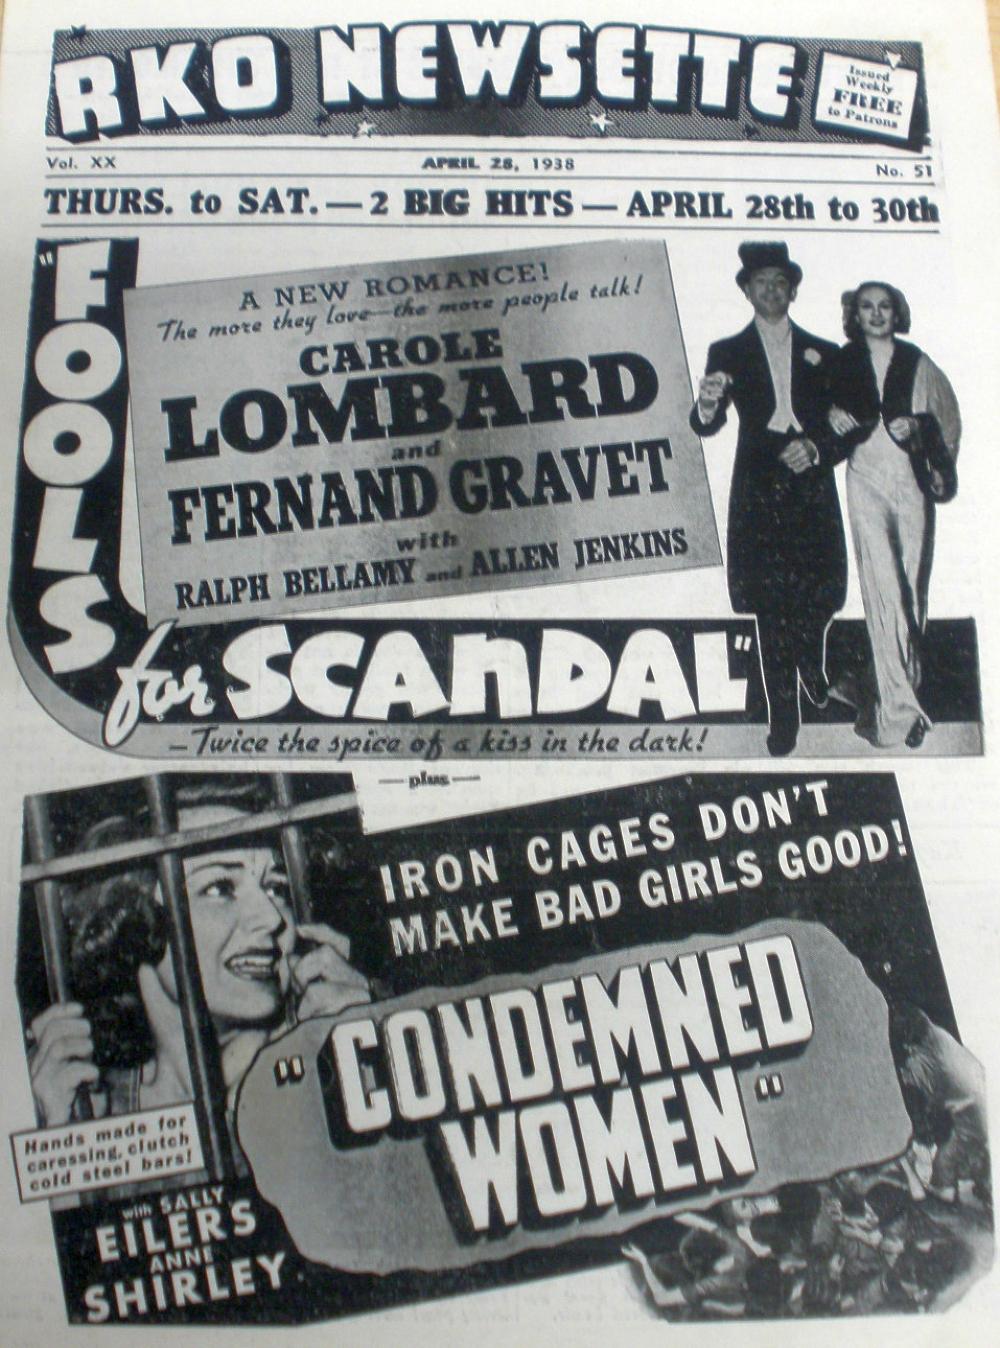 carole lombard fools for scandal rko newsette 00a